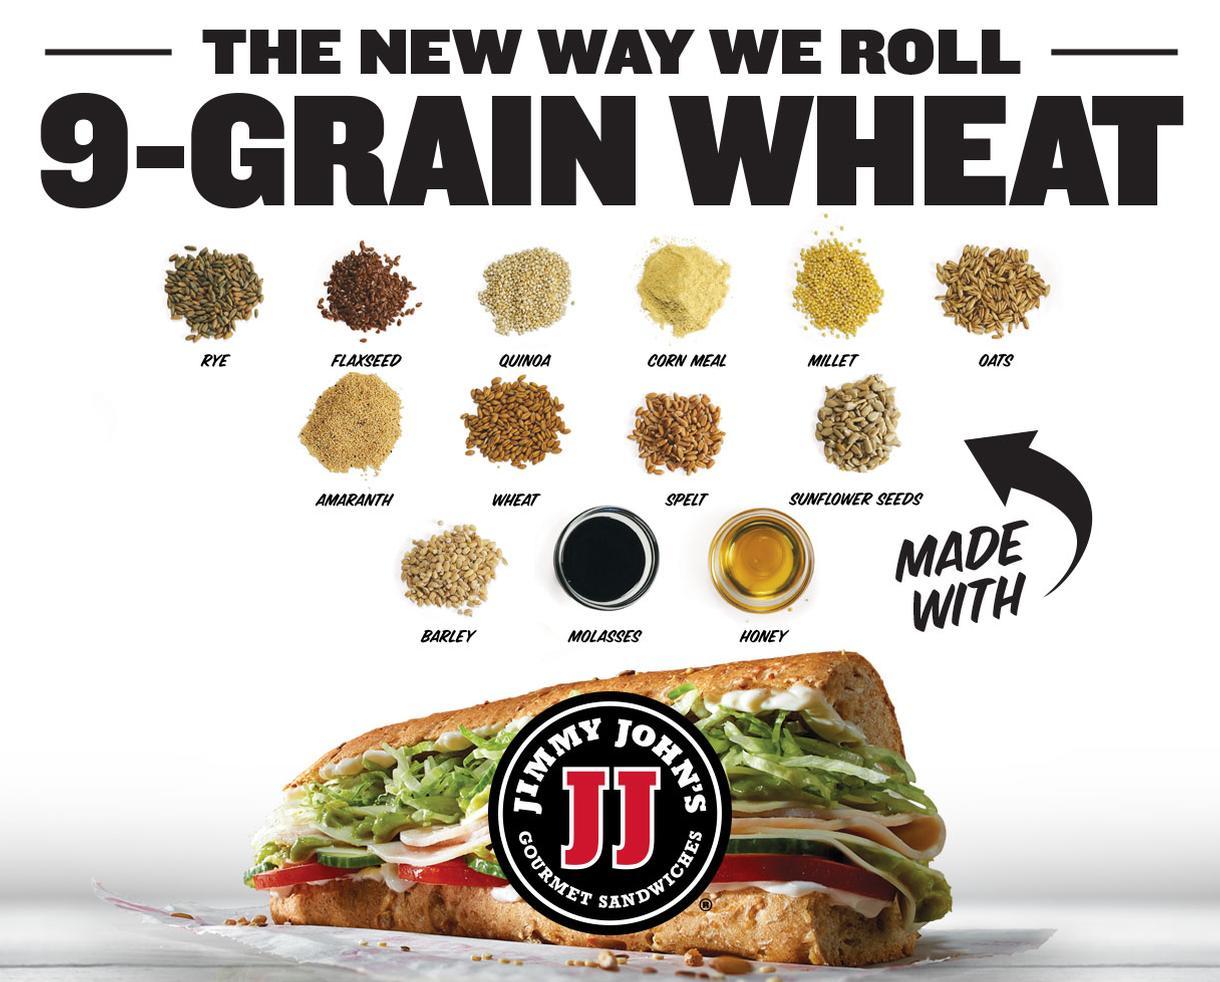 Wheat Yeah Freak Yeah! Try Jimmy John's NEW 9-Grain Wheat Sub!